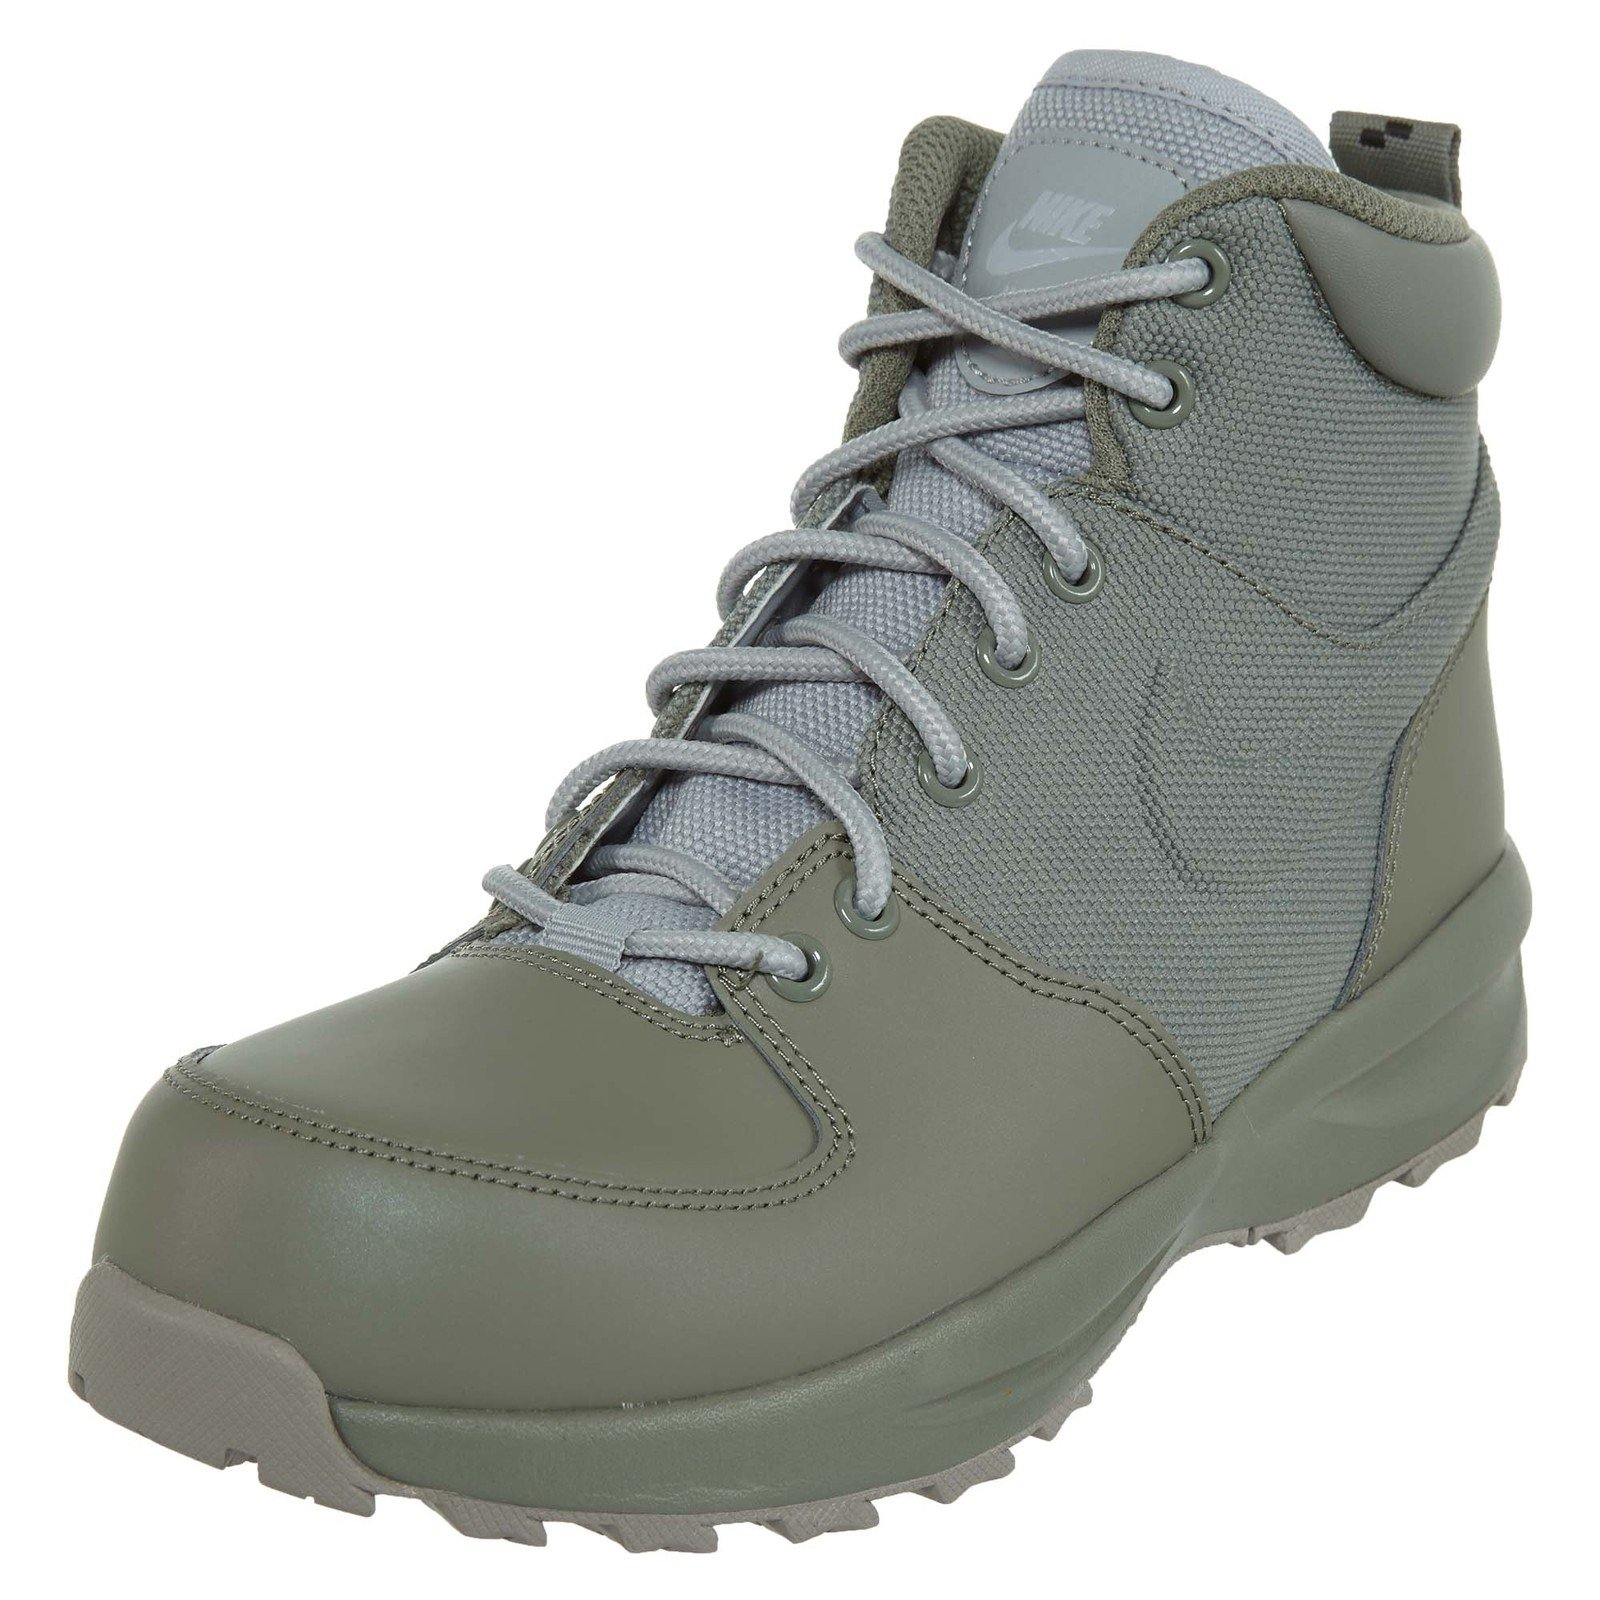 reputable site 72c51 bed6d Galleon - NIKE Boy s Manoa 17 (GS) Boot, Dark Stucco Wolf Grey-Cobblestone  5.5Y